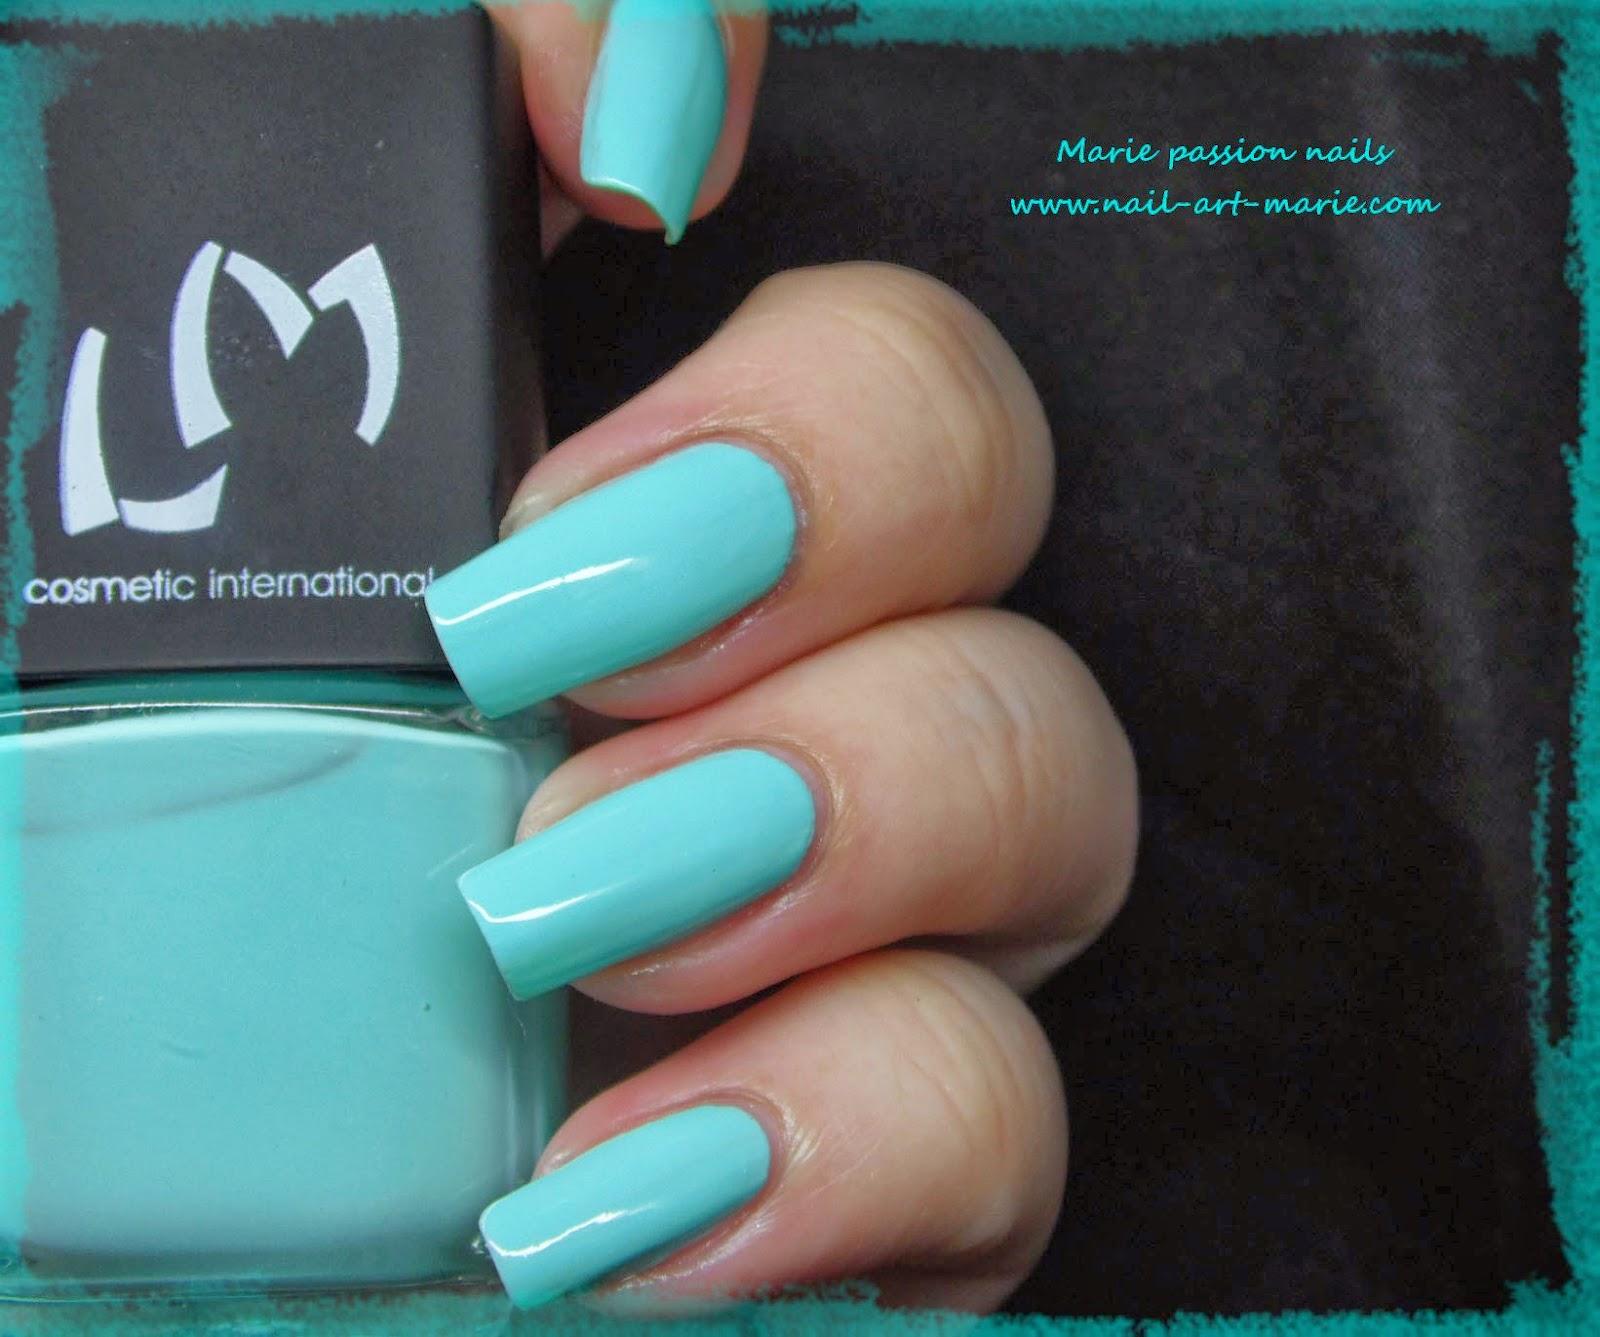 LM Cosmetic Mintcream3